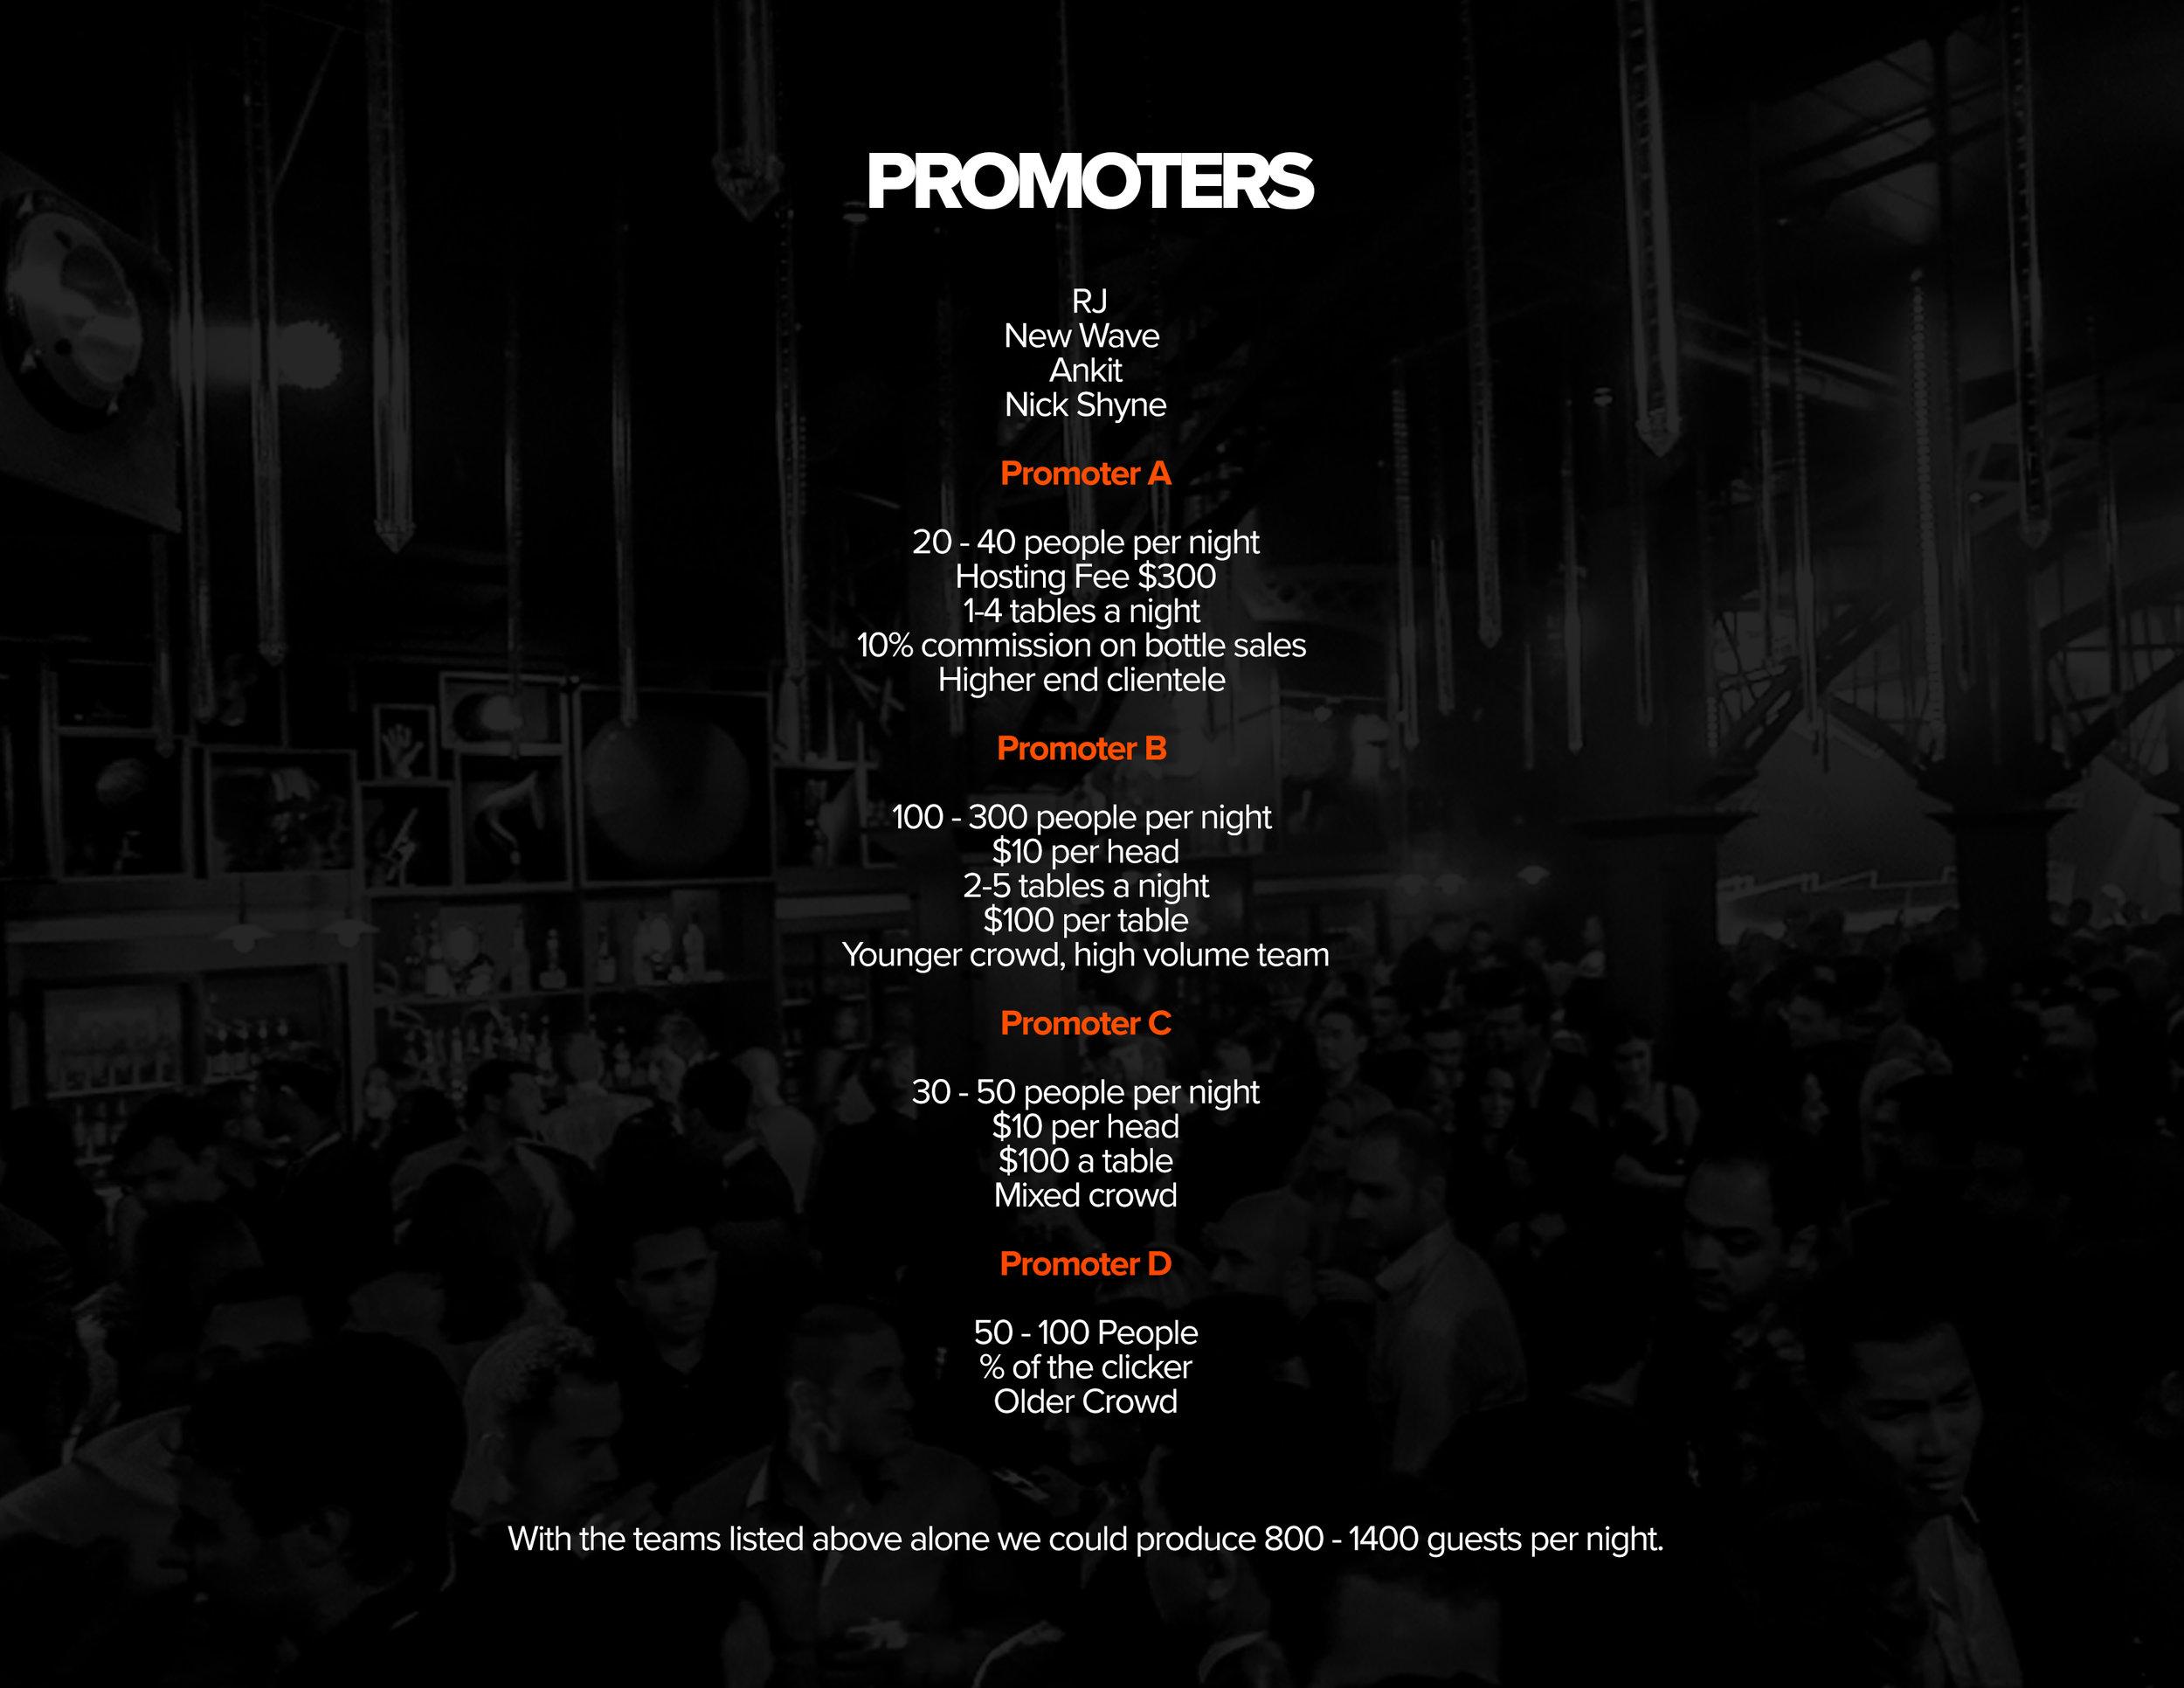 Promoters002_8.5x11.jpg